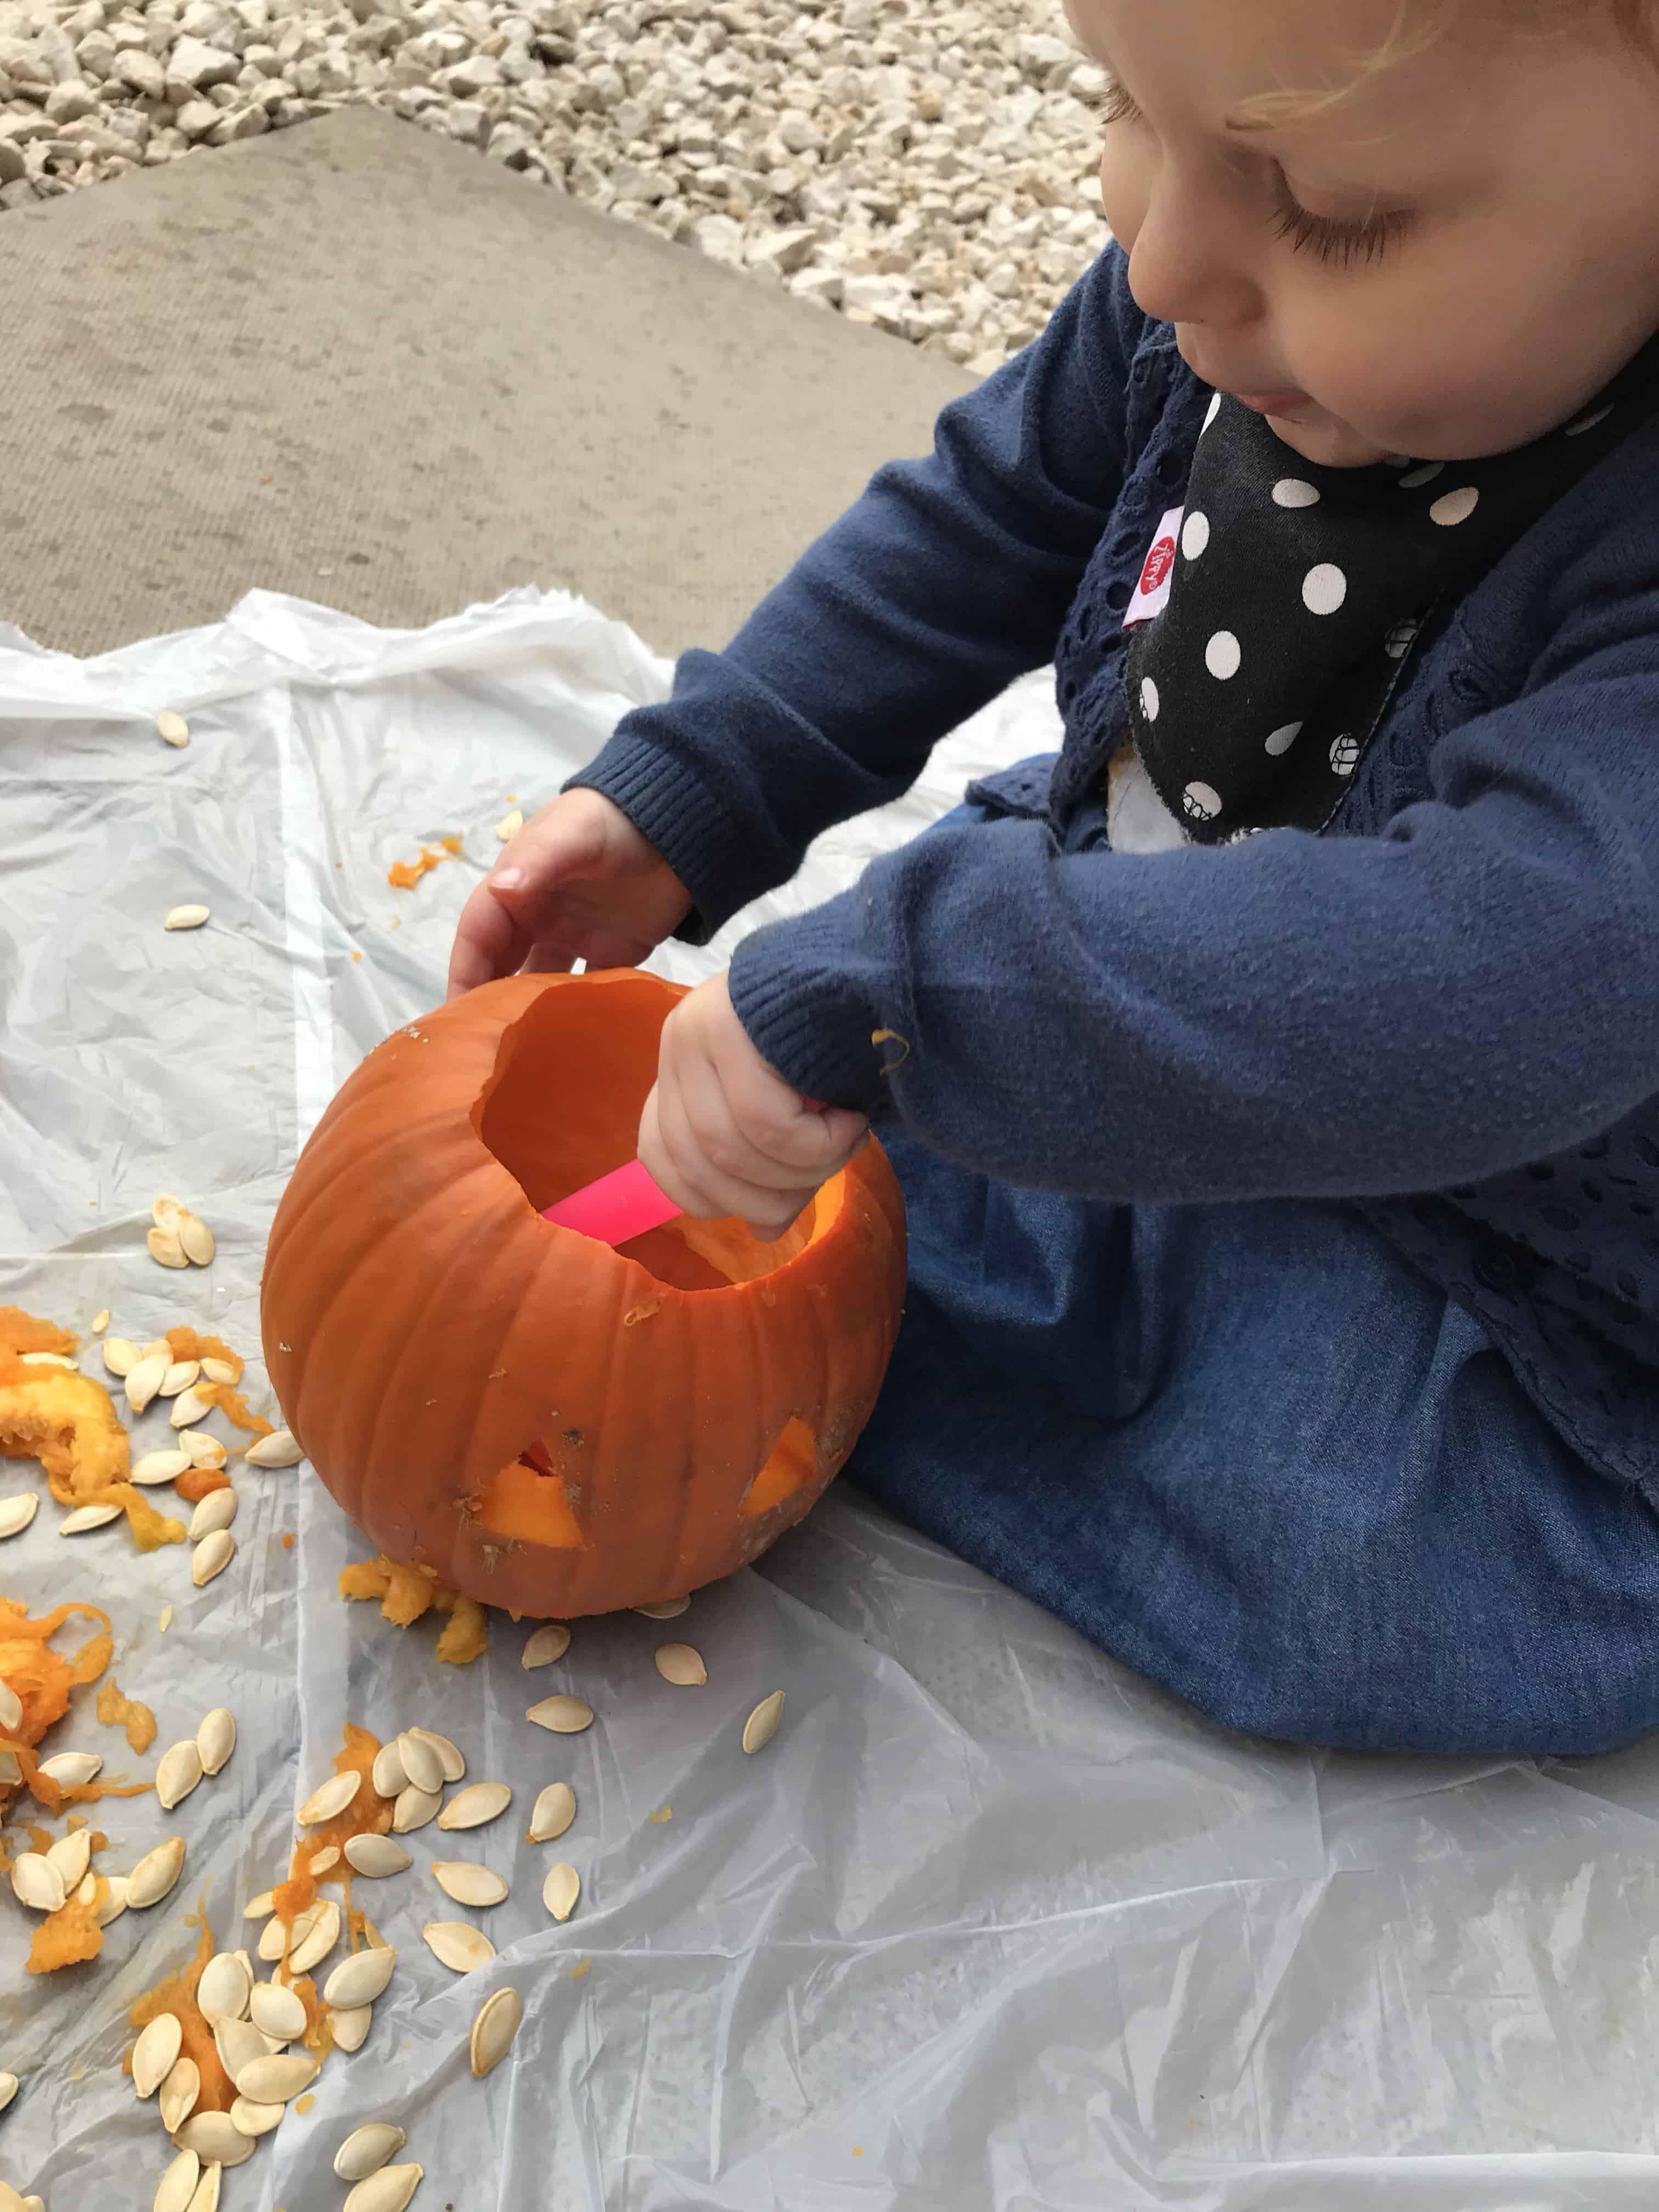 Using glow sticks in pumpkins